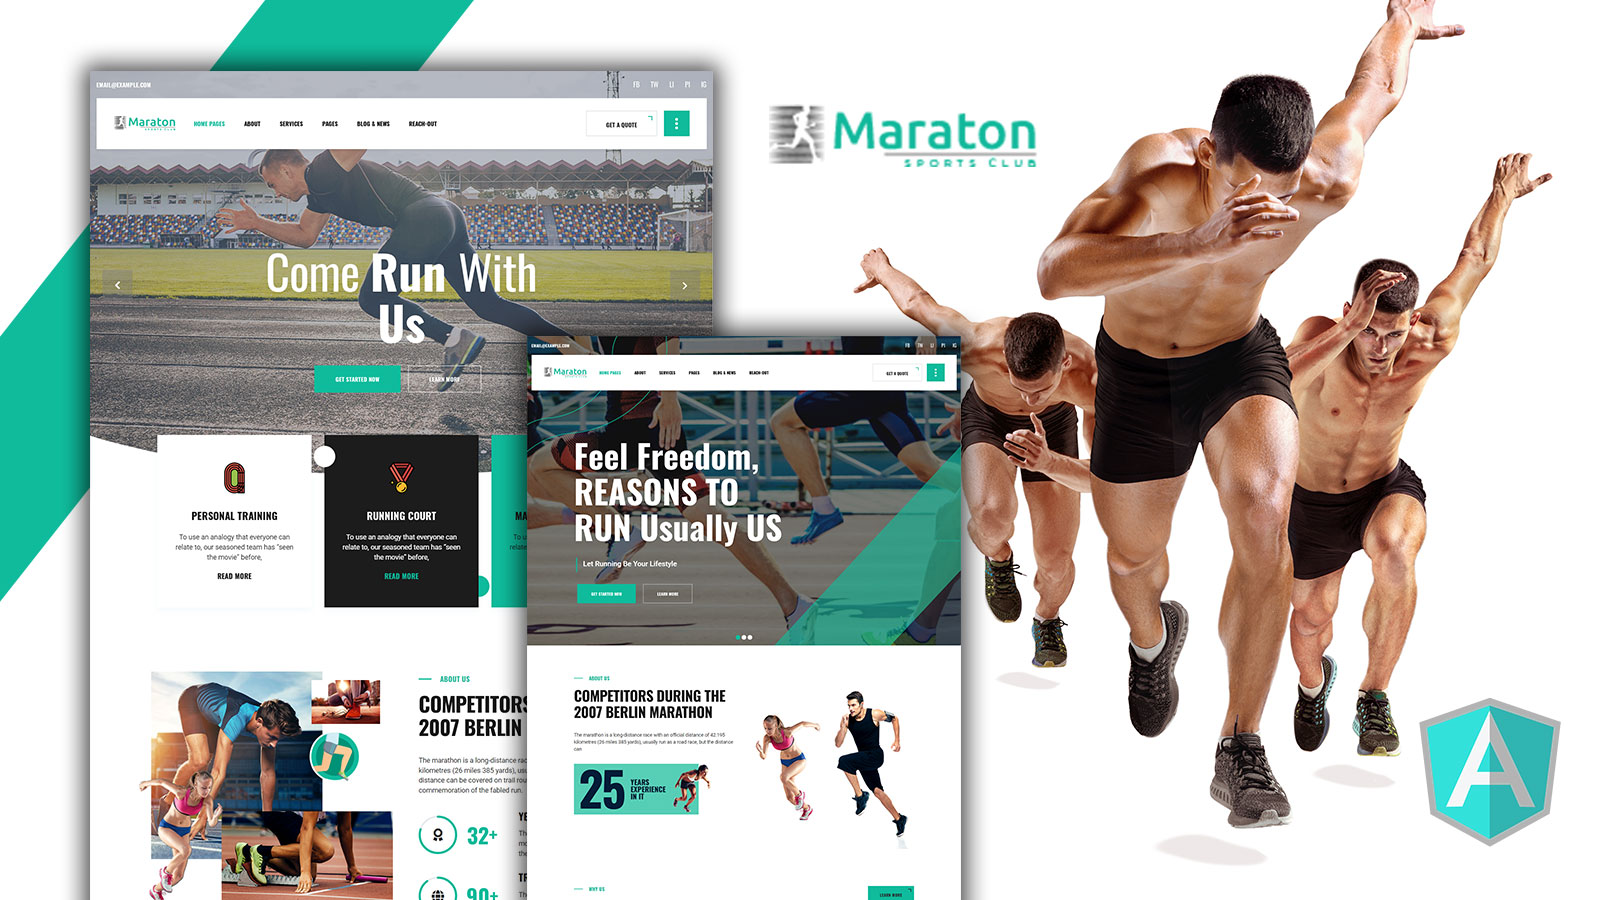 Maraton - Maraton Angular Template